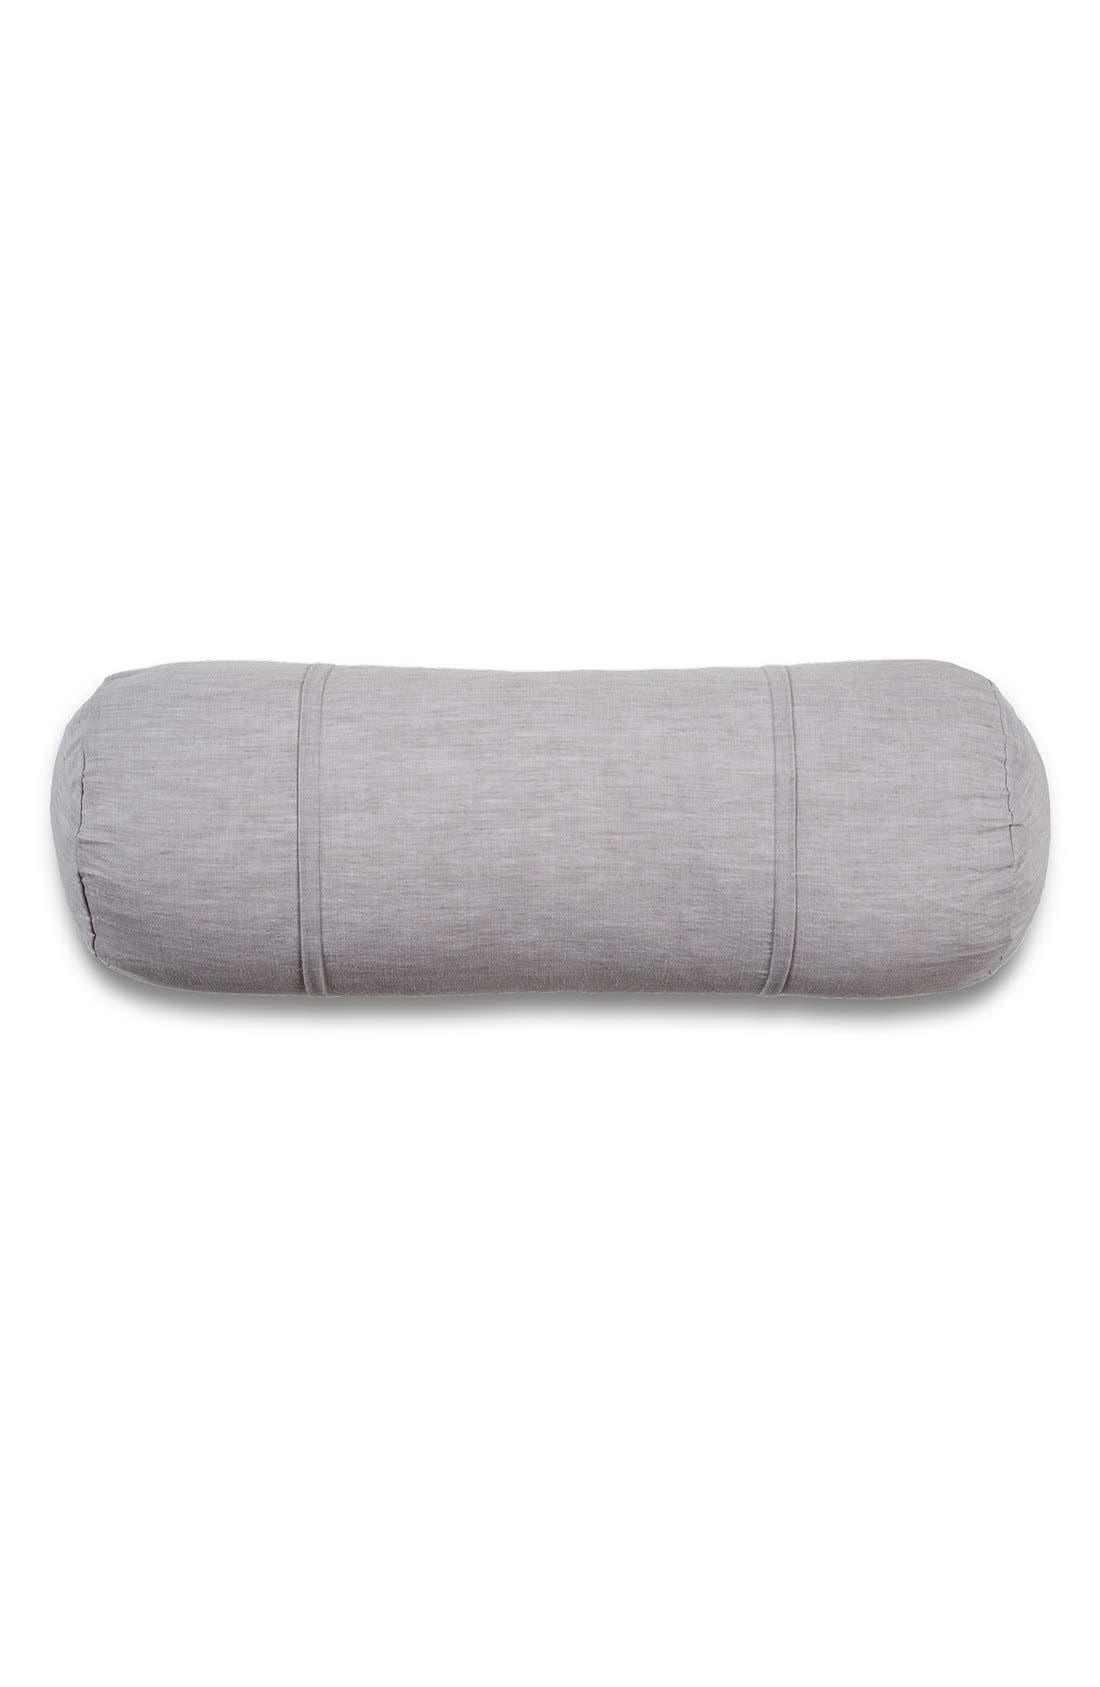 PomPomat Home 'Louwie' Bolster Pillow,                             Main thumbnail 2, color,